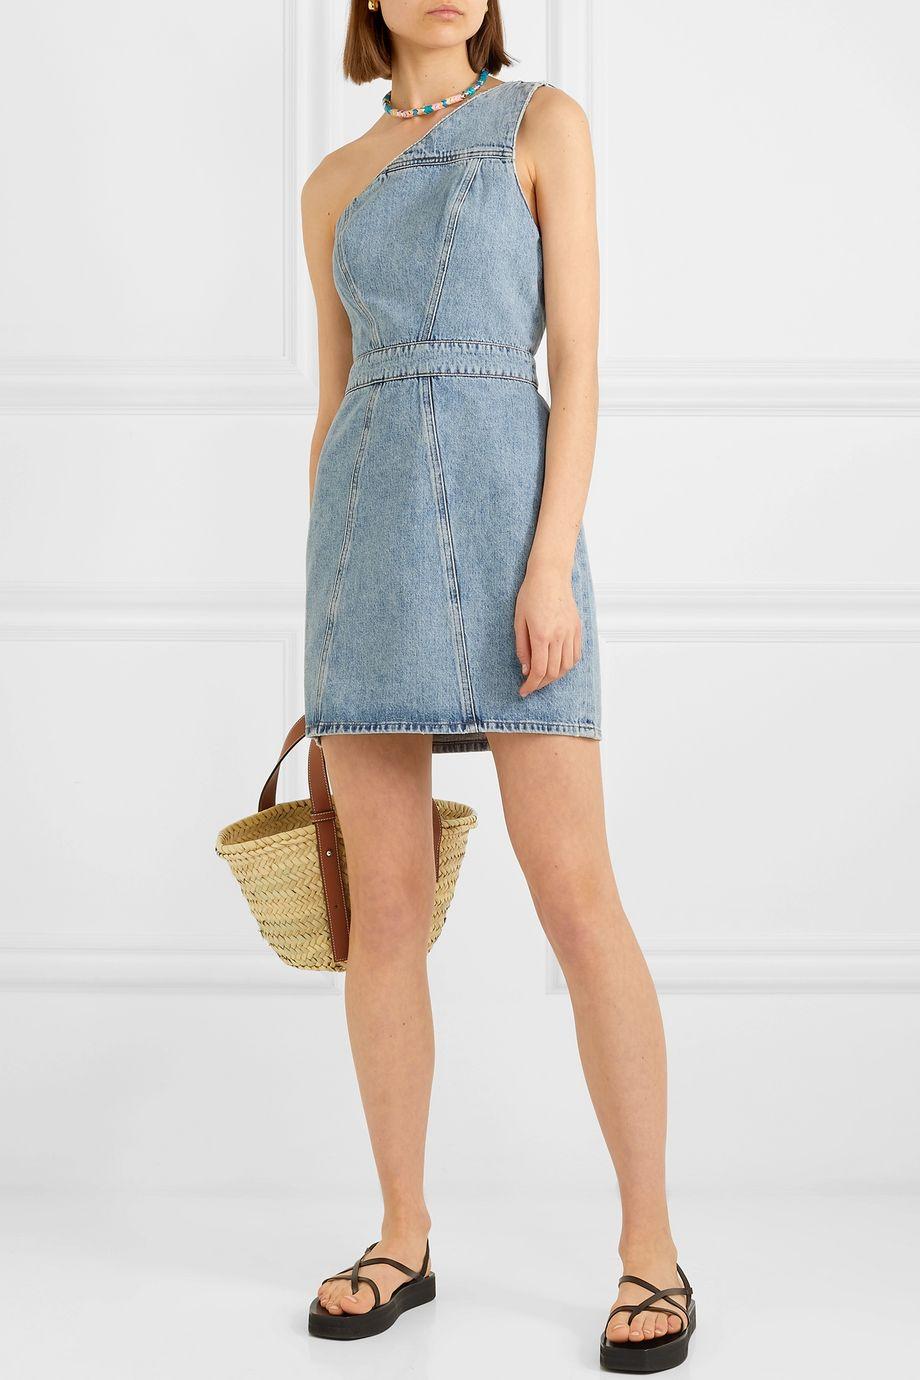 AGOLDE Annex one-shoulder denim mini dress